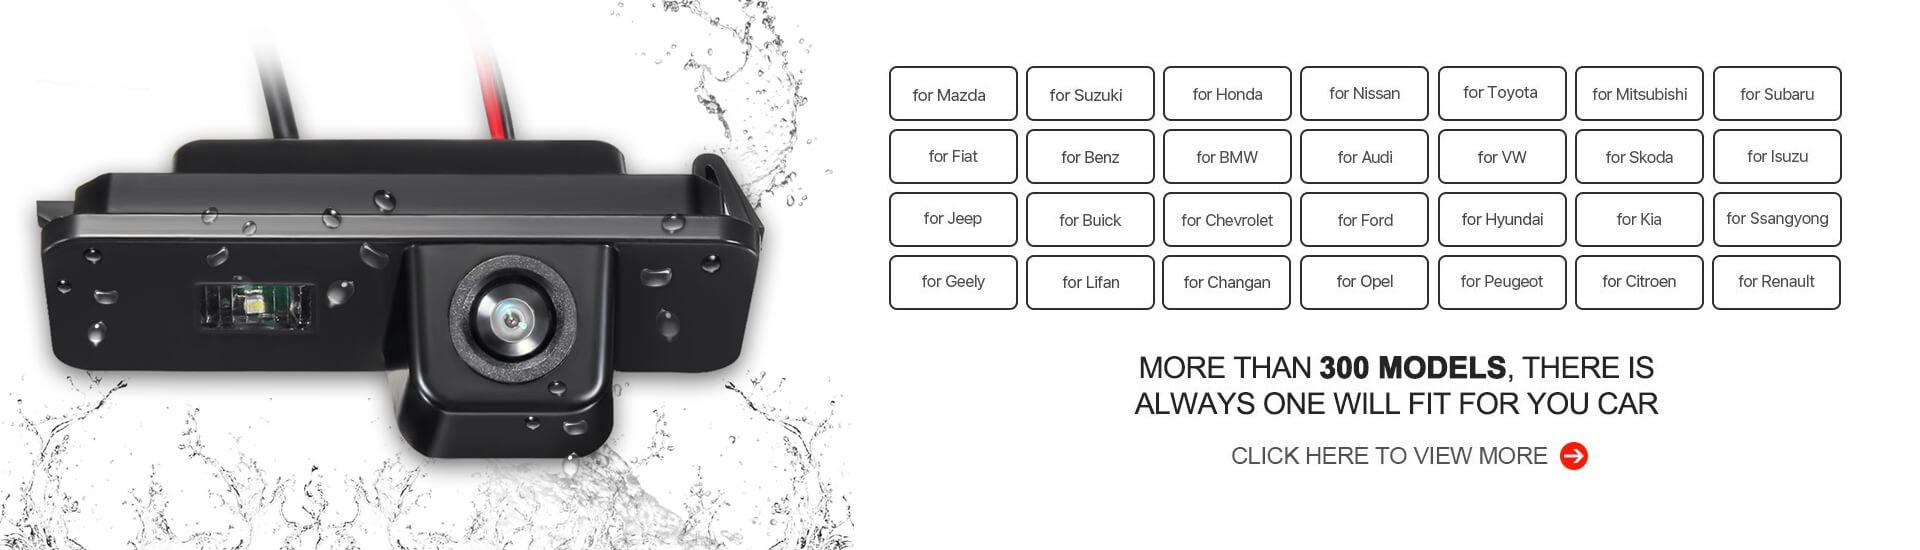 new-rear-view-camera-more-than-300-models